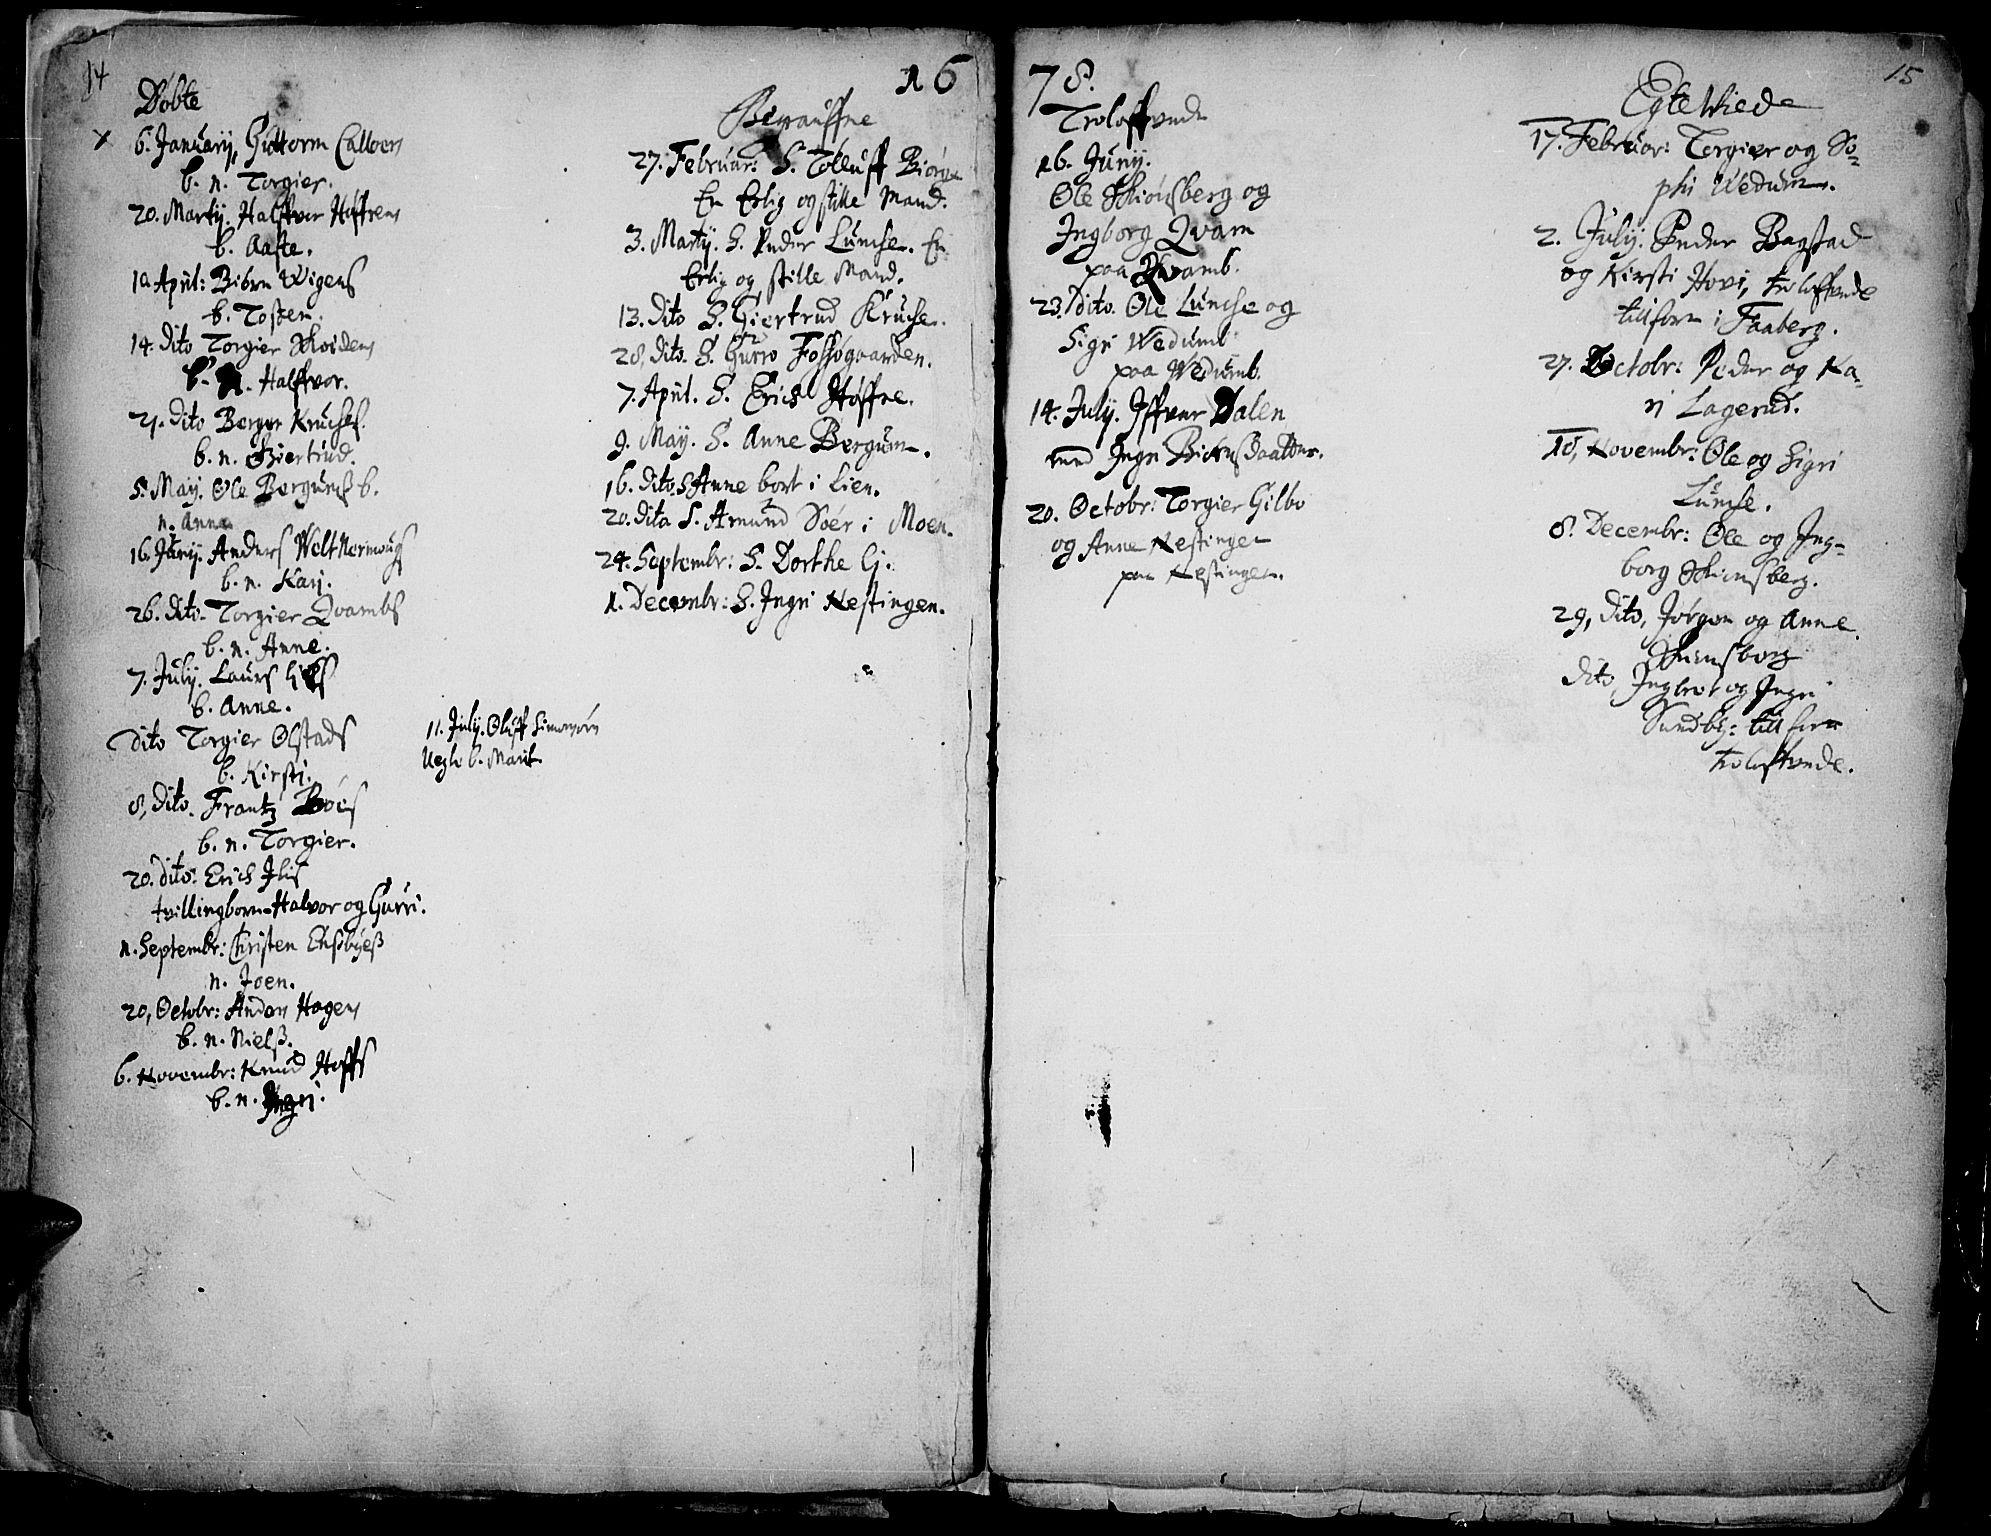 SAH, Øyer prestekontor, Ministerialbok nr. 1, 1671-1727, s. 14-15